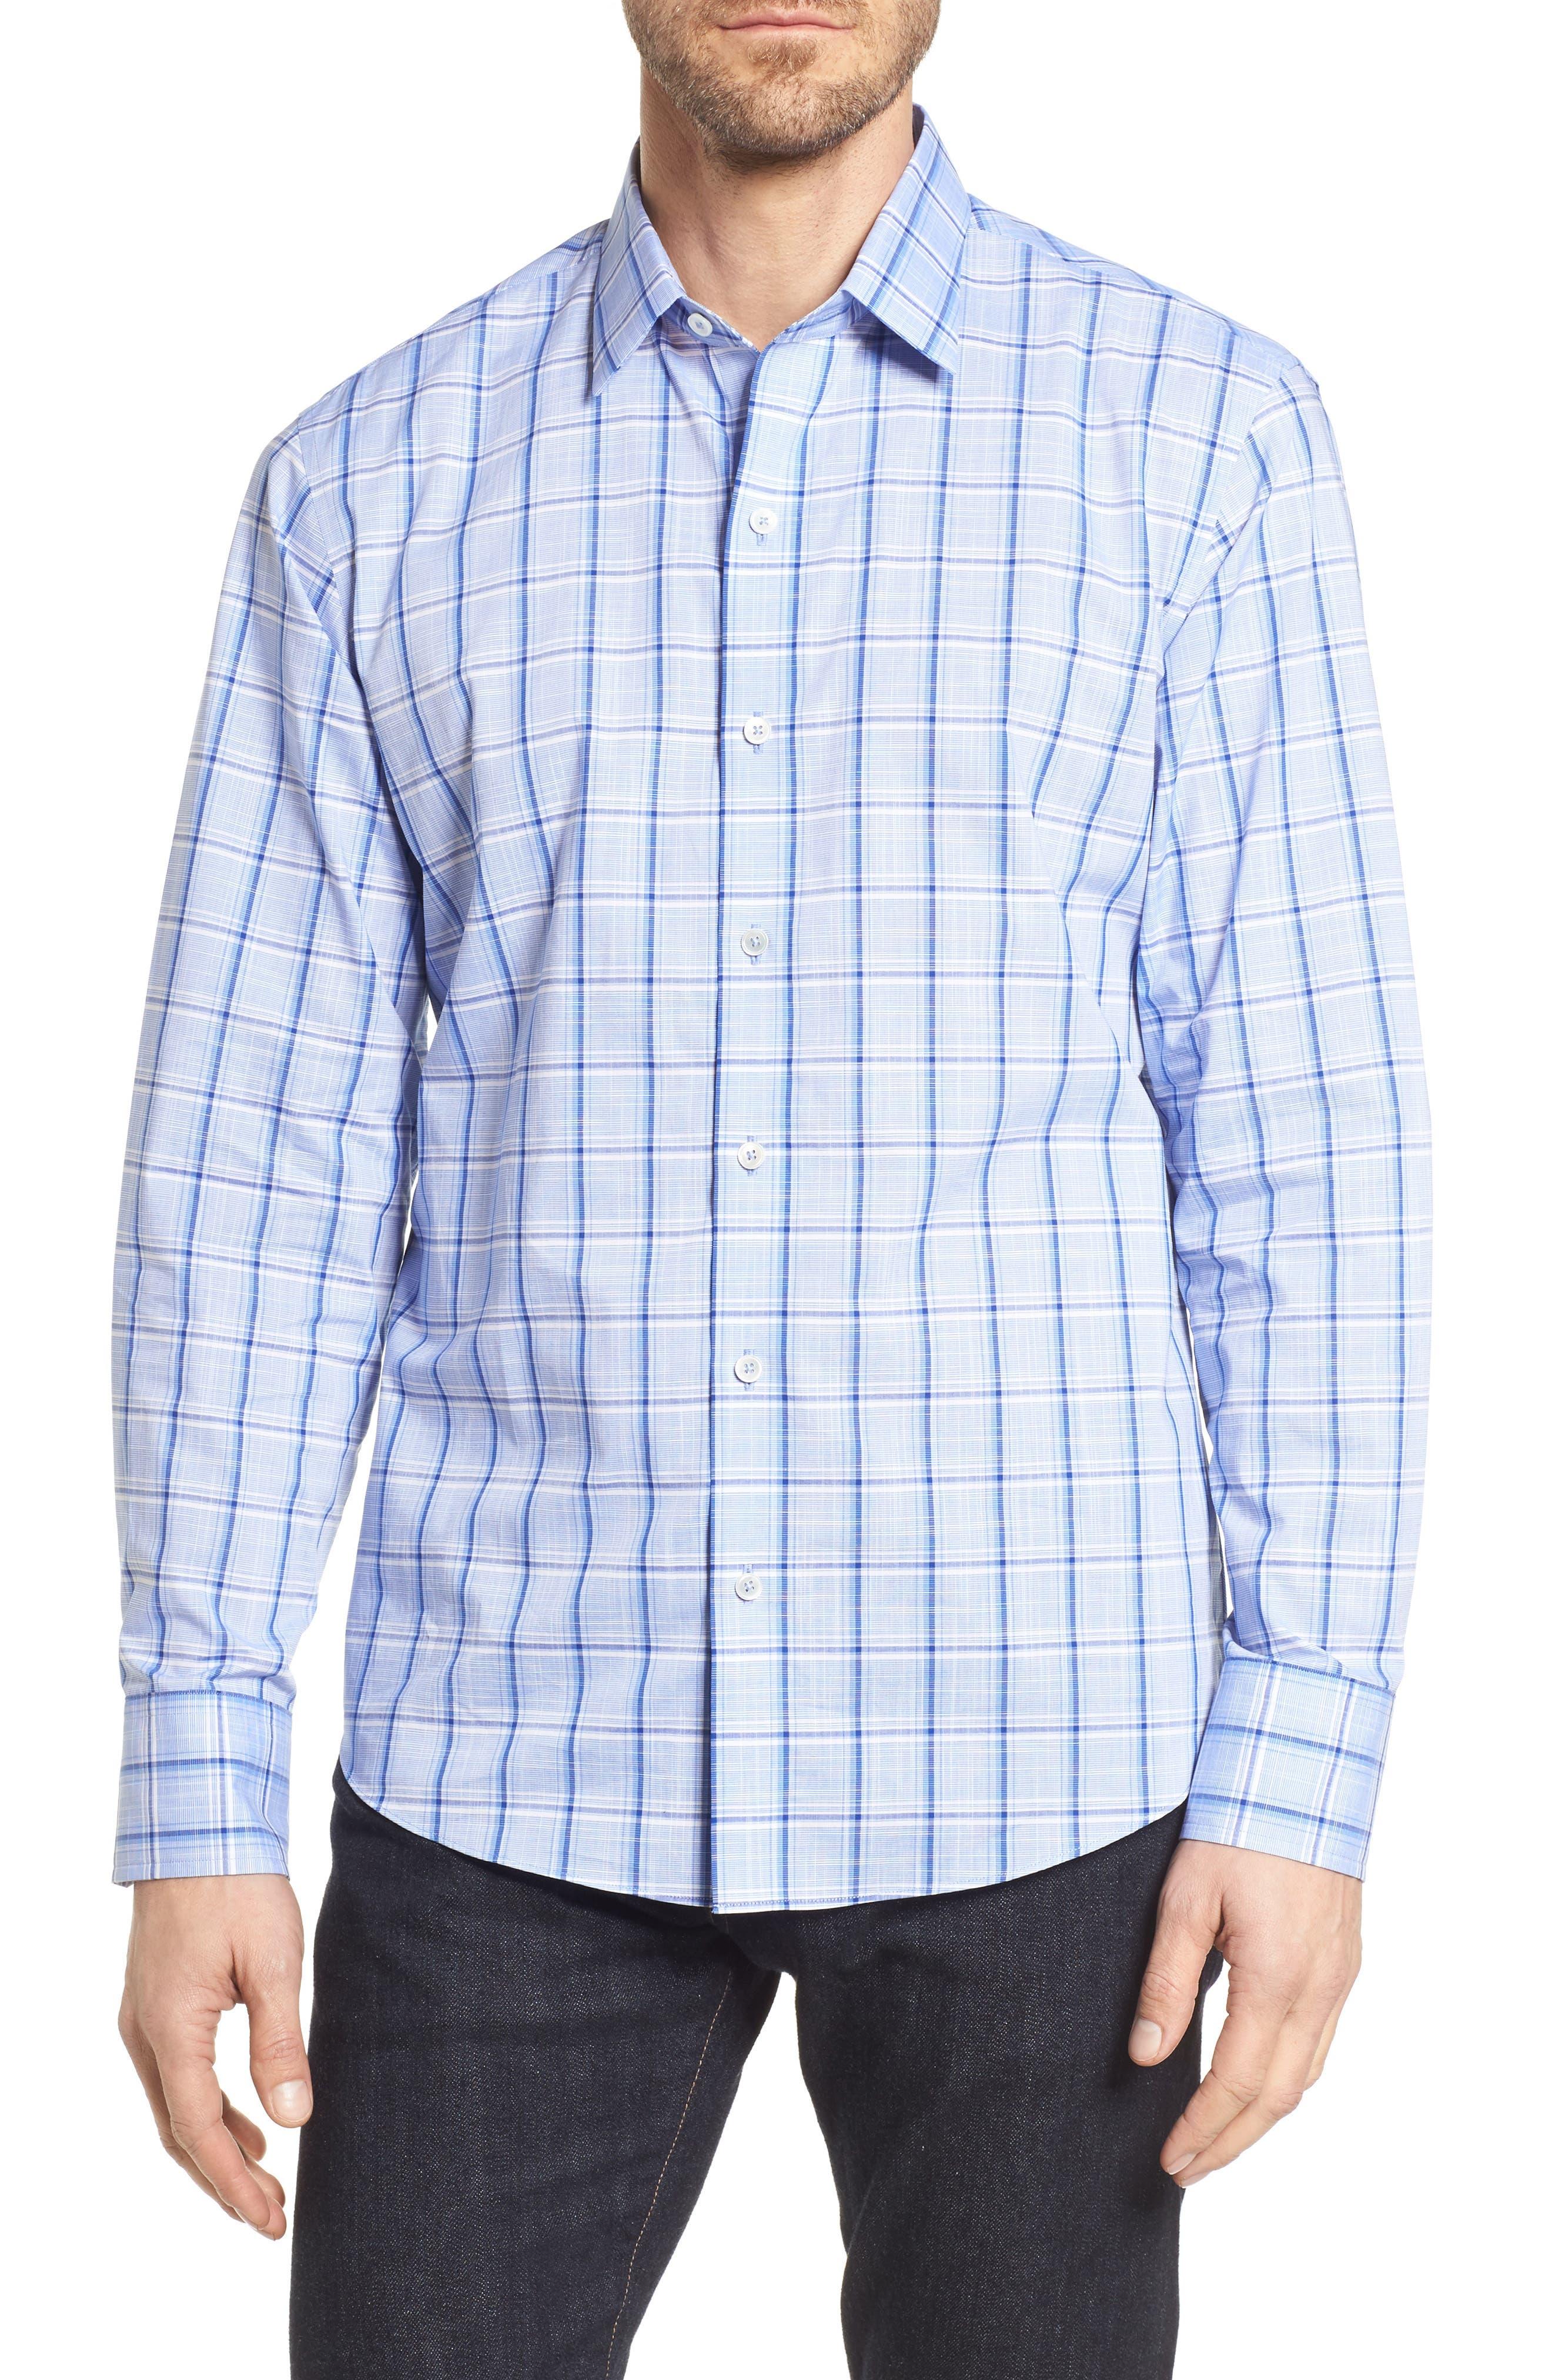 Washington Plaid Sport Shirt,                         Main,                         color, Blue